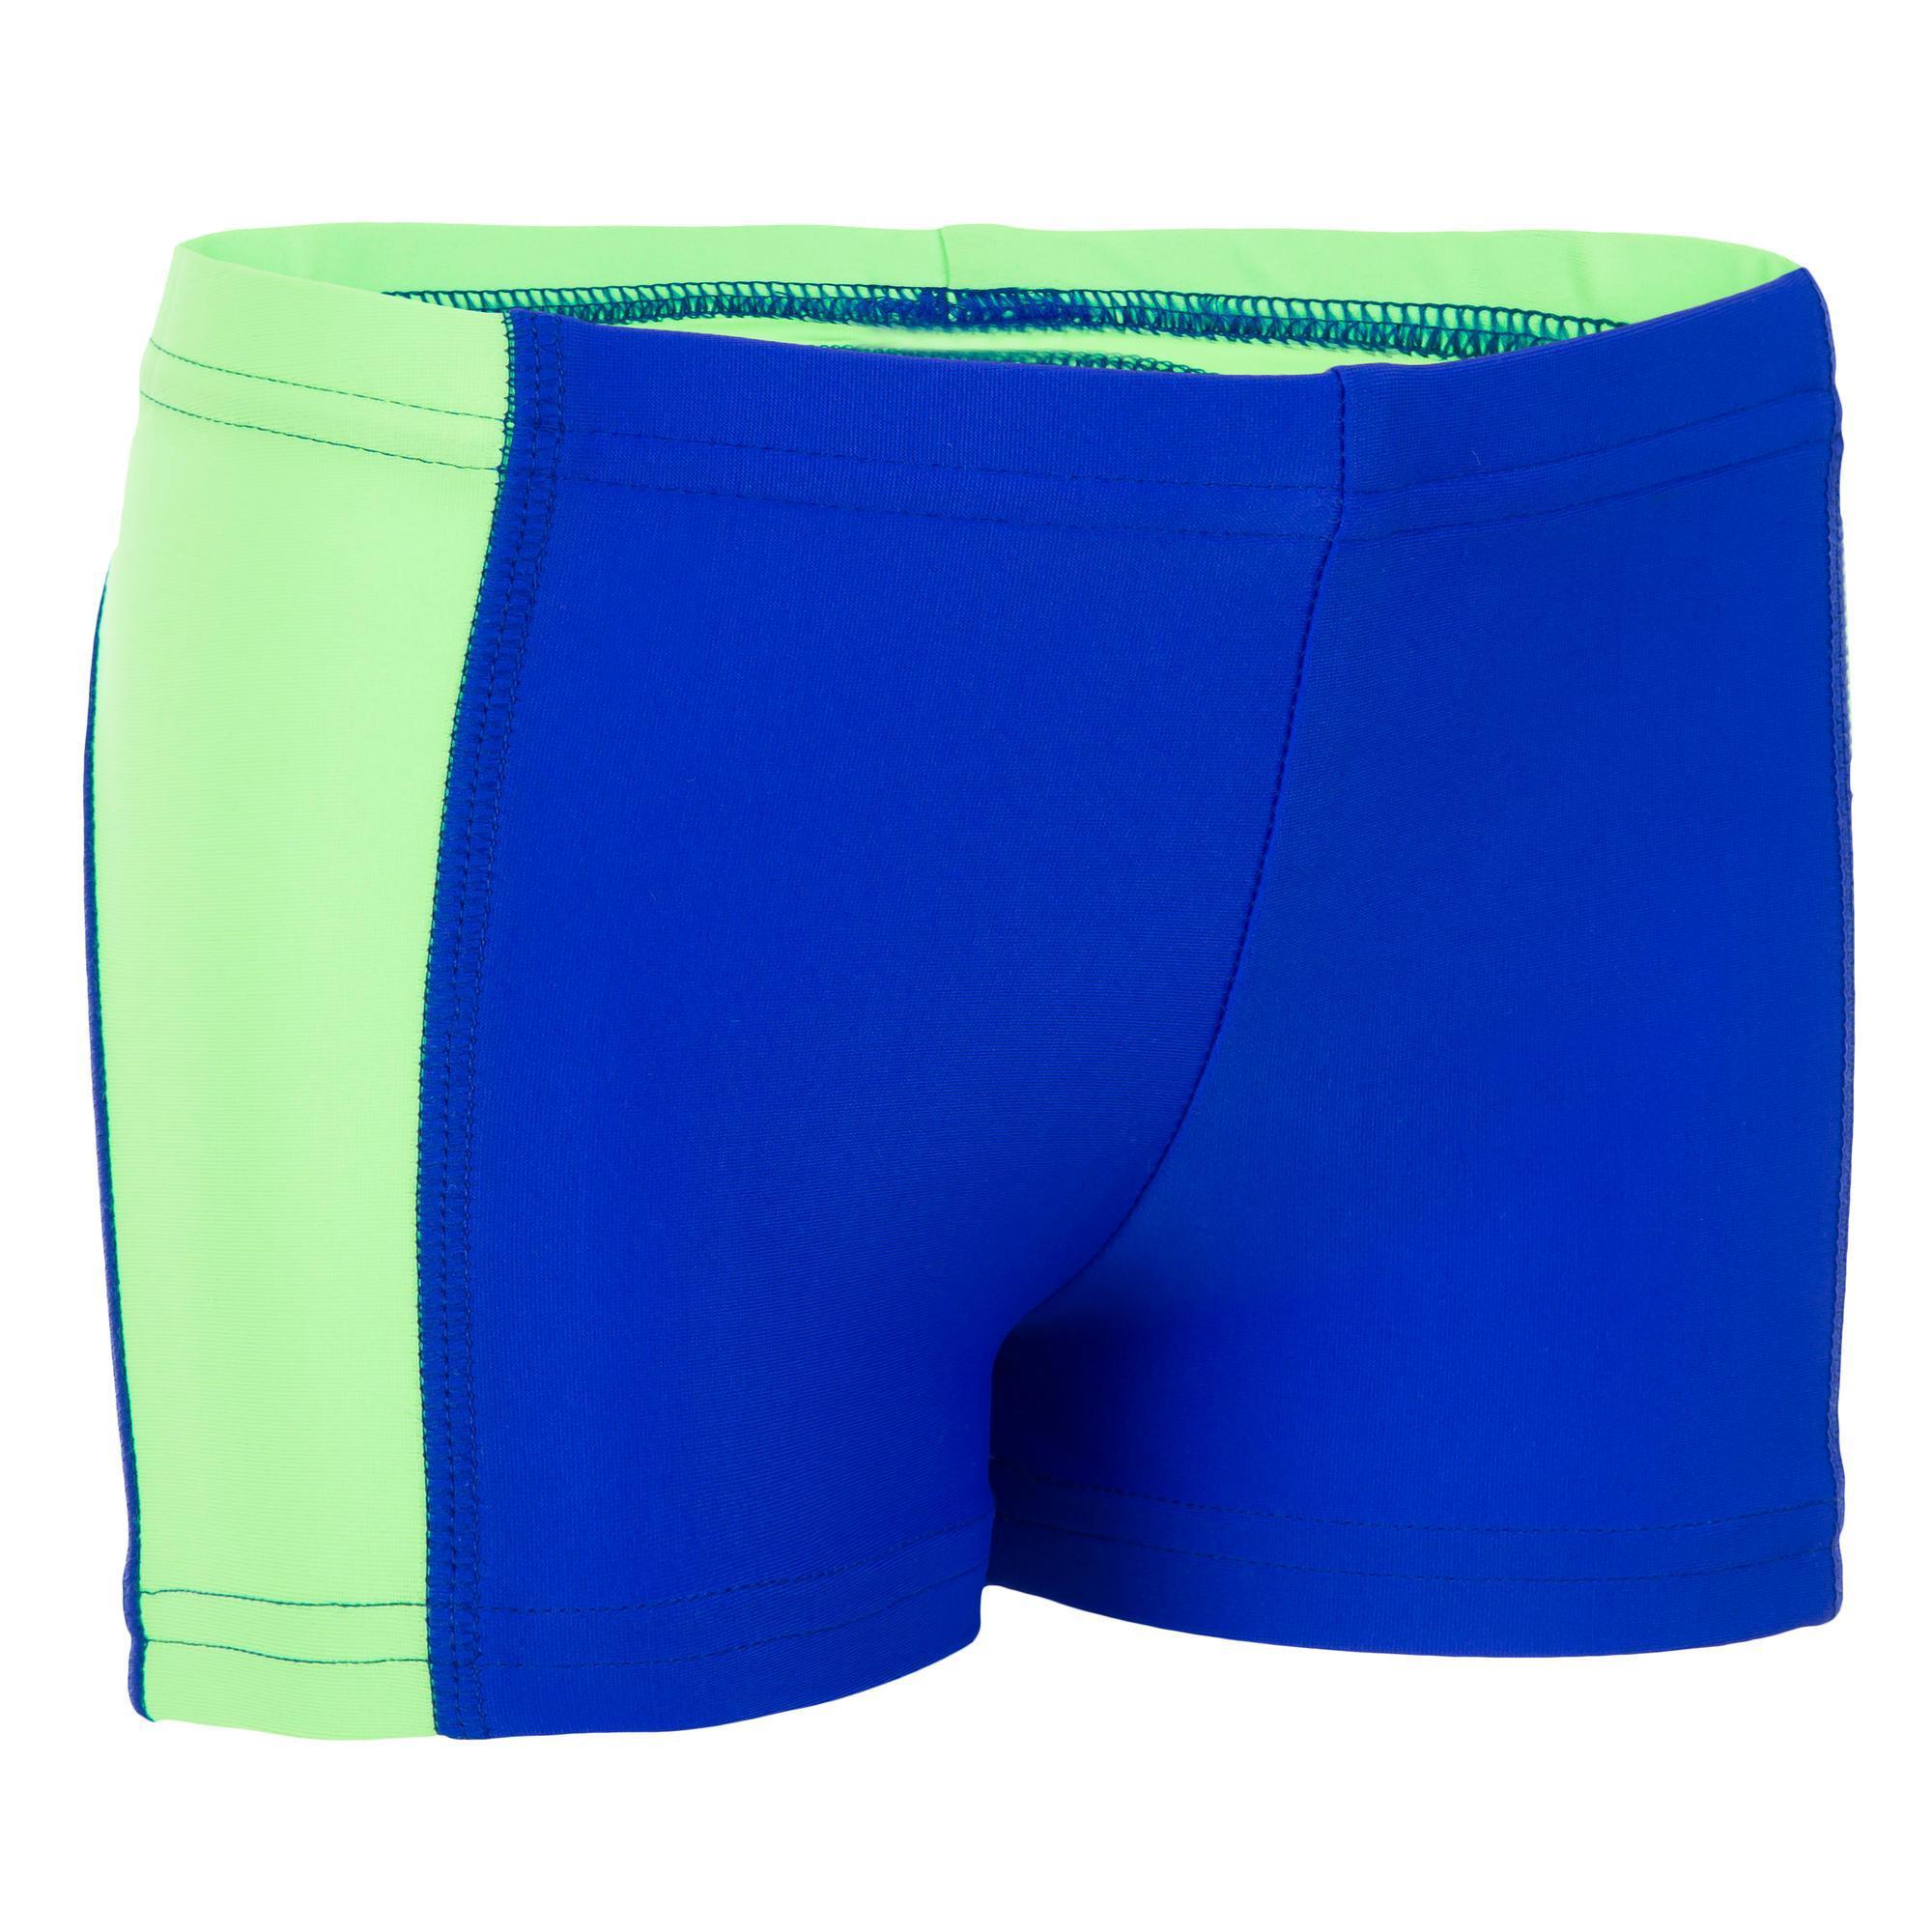 Baby,Kinder,Jungen,Kinder Badehose Boxer Titou Yoke Baby blau/grün | 03583788267706